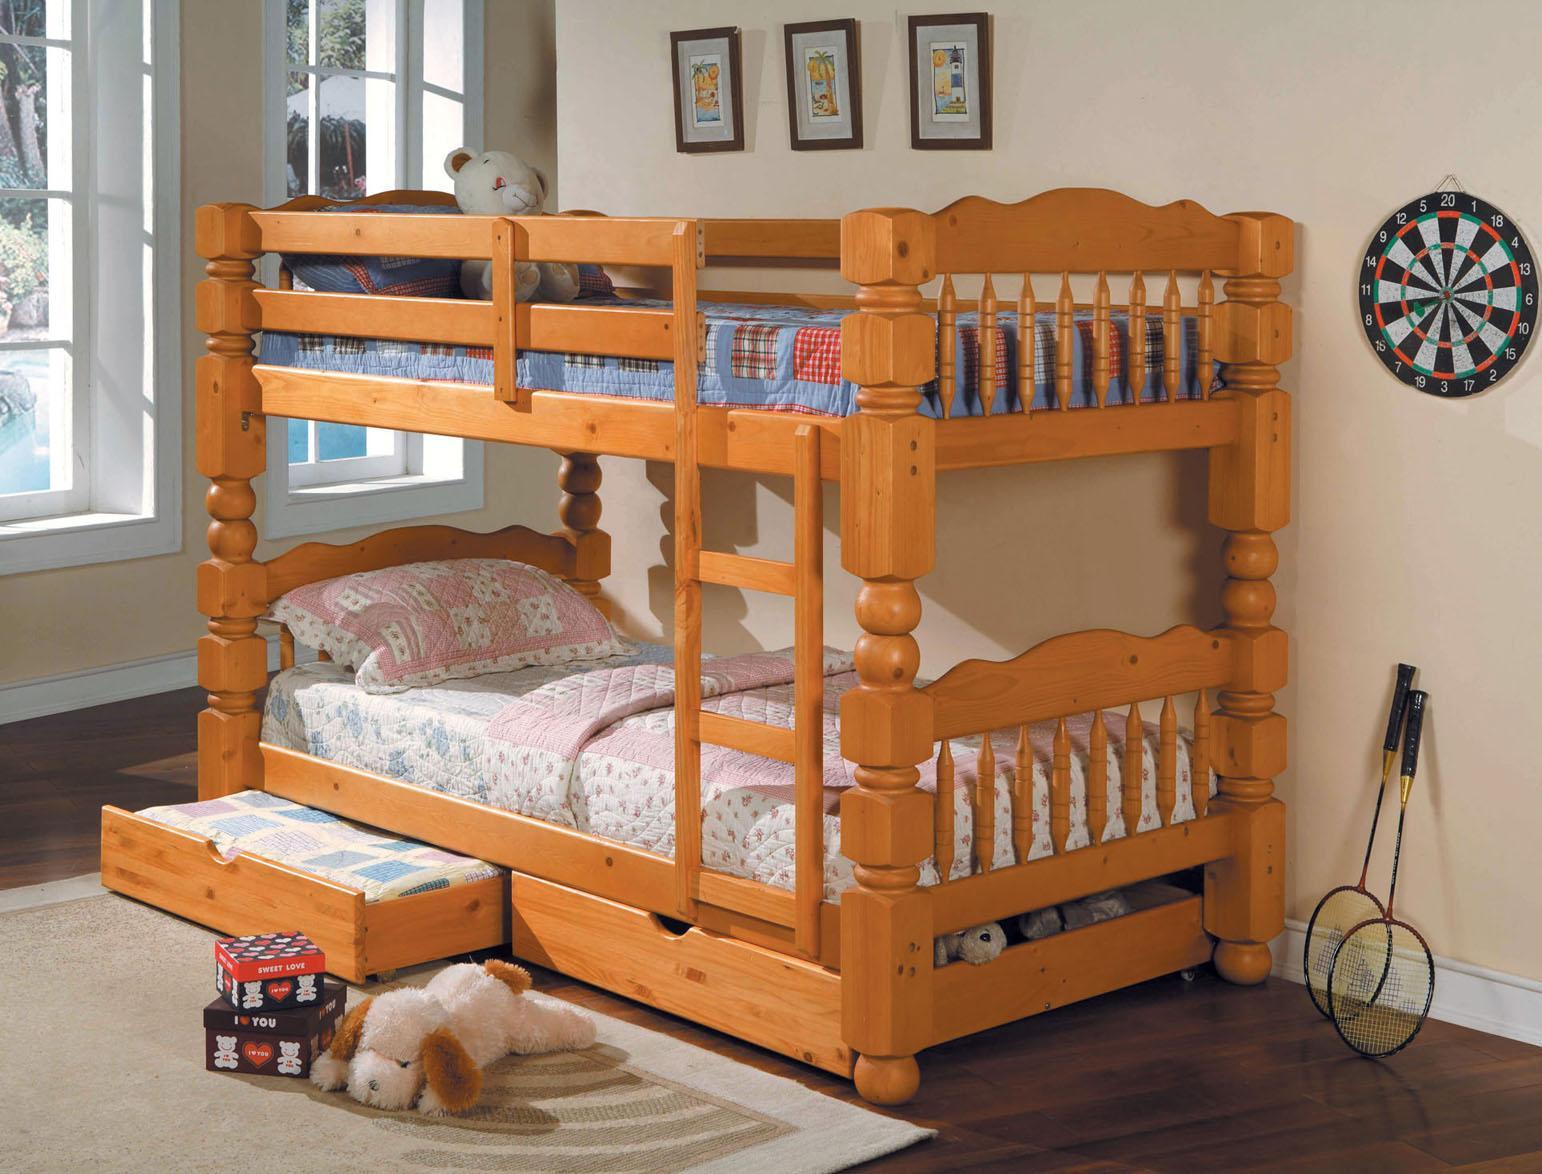 Acme Furniture Benji Twin Bunkbed w/ Storage Drawers - Item Number: 02575 STORAGE